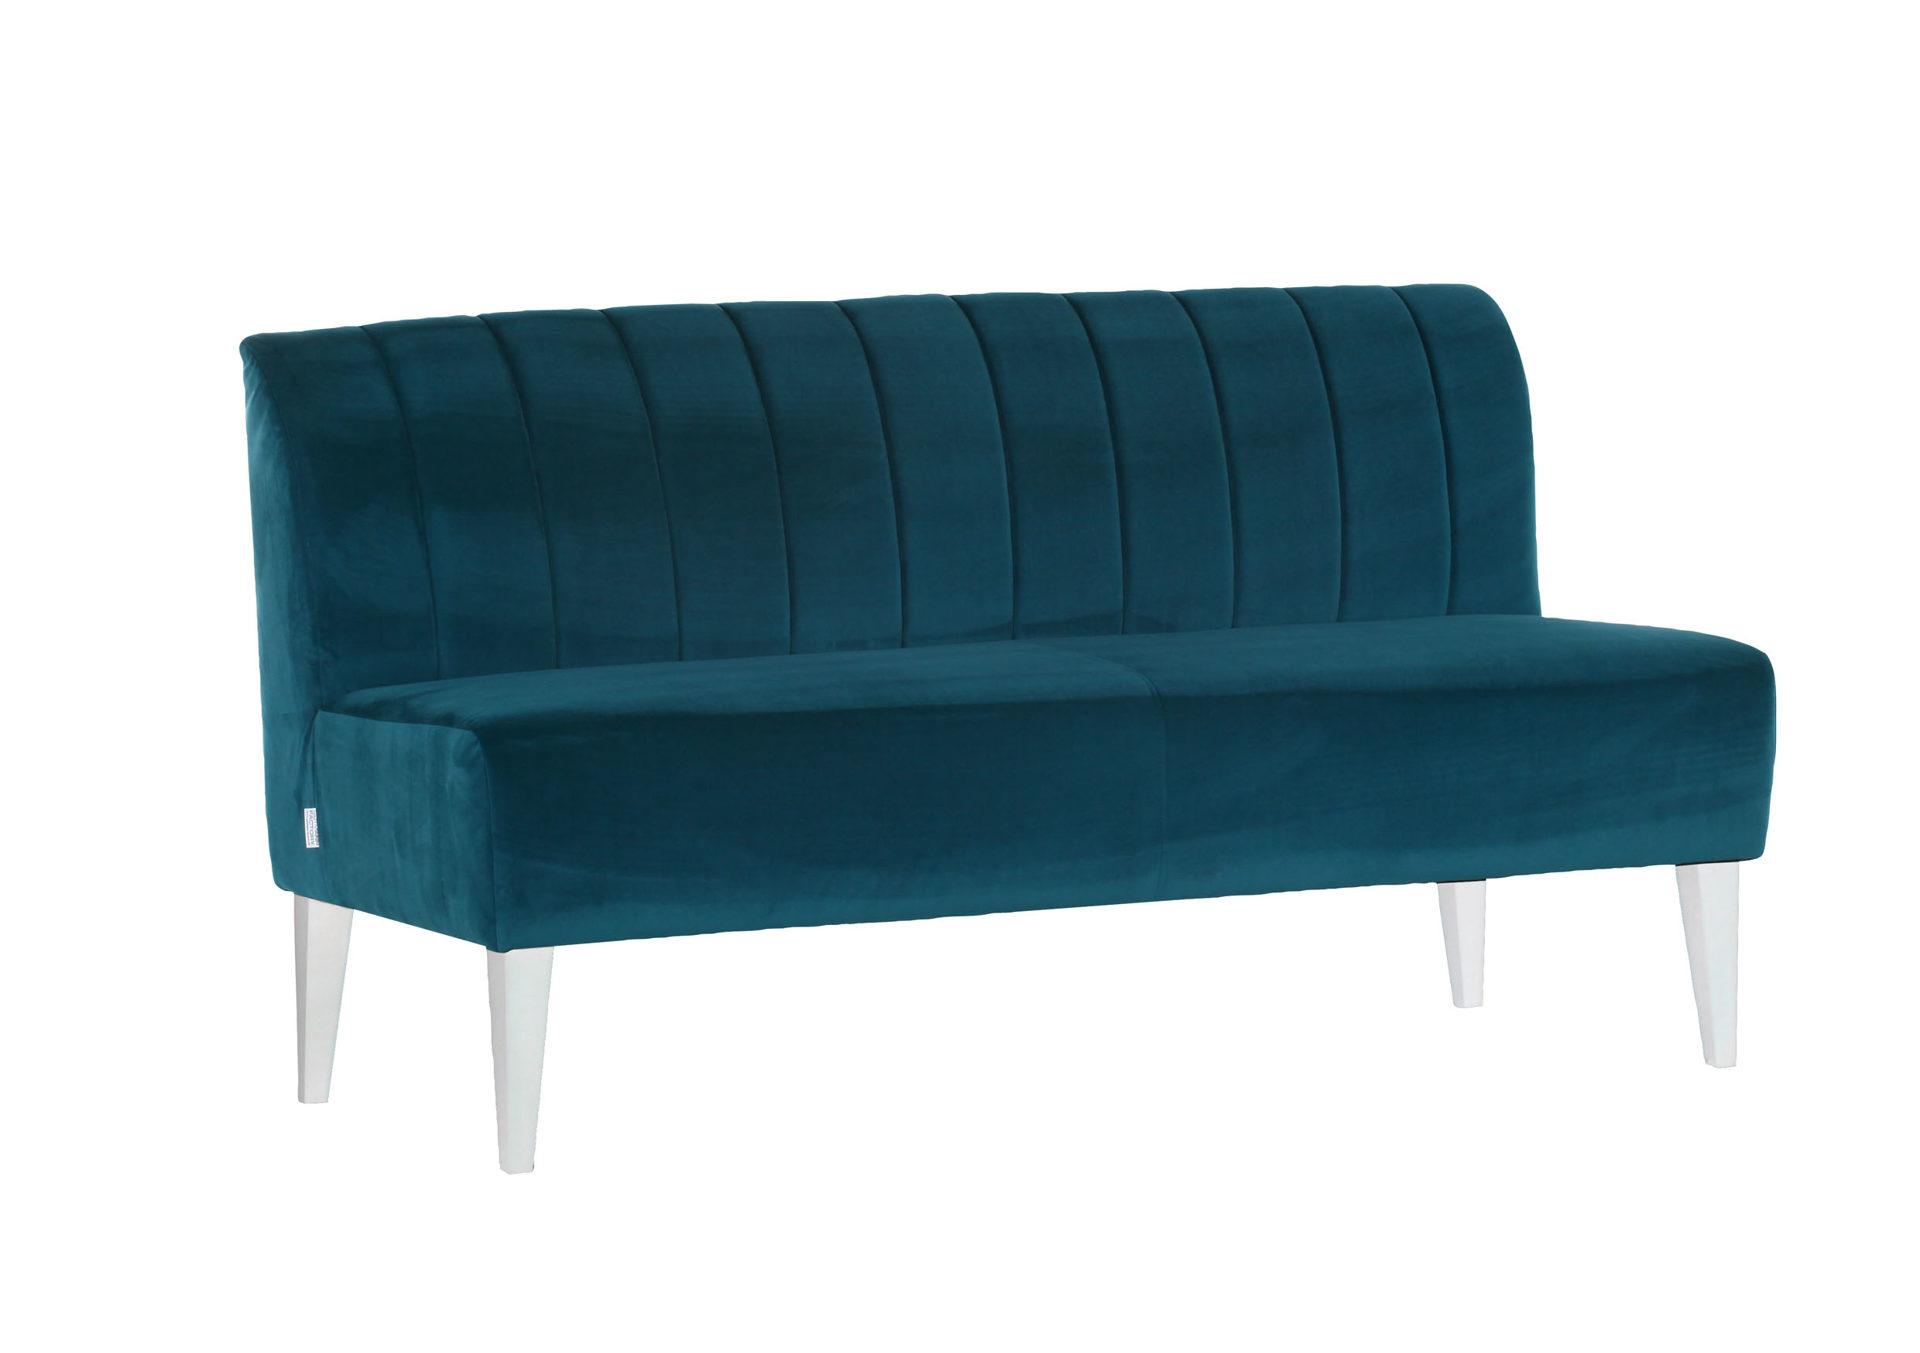 Sofa Im Retro Stil Als Polstermöbel Mit Flair Petrolfarbener Stoff